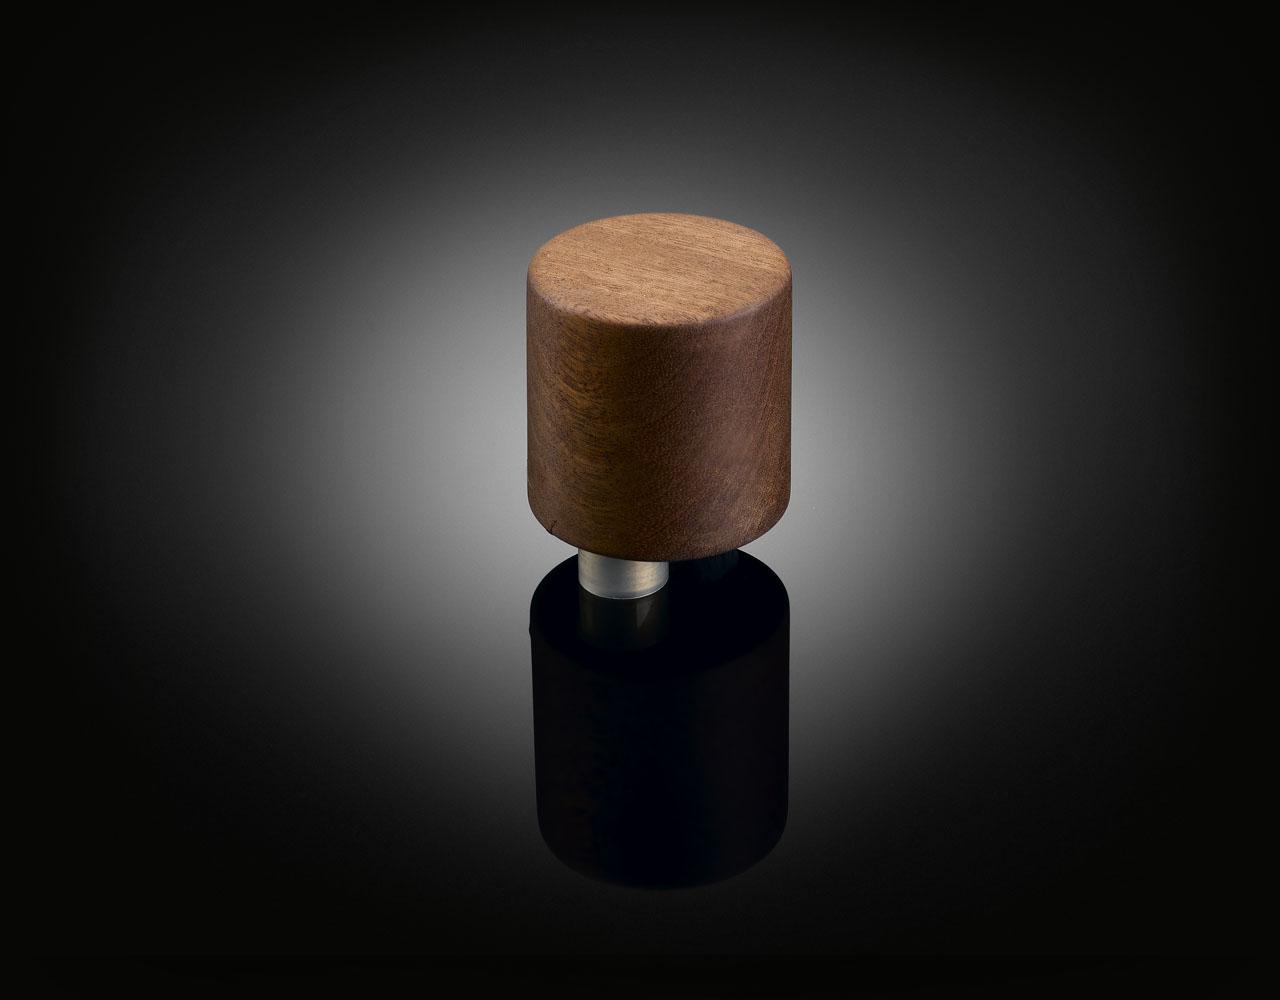 Bespoke walnut door knob designed by Terrence Woodgate supplied by izé